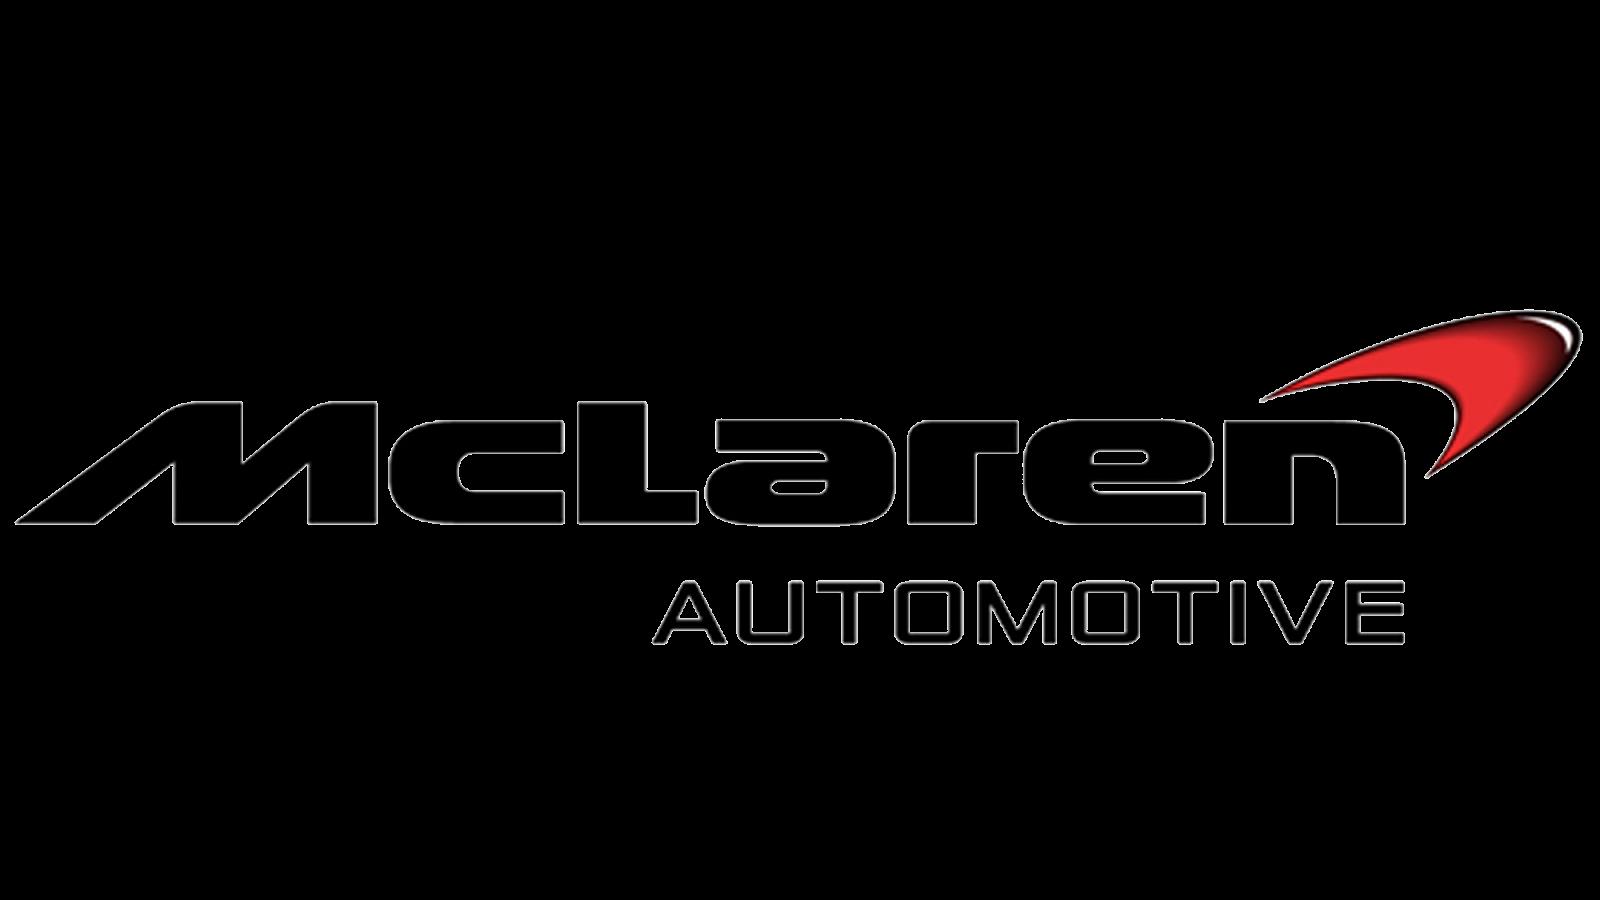 British-car-brands-McLaren-logotype.jpg